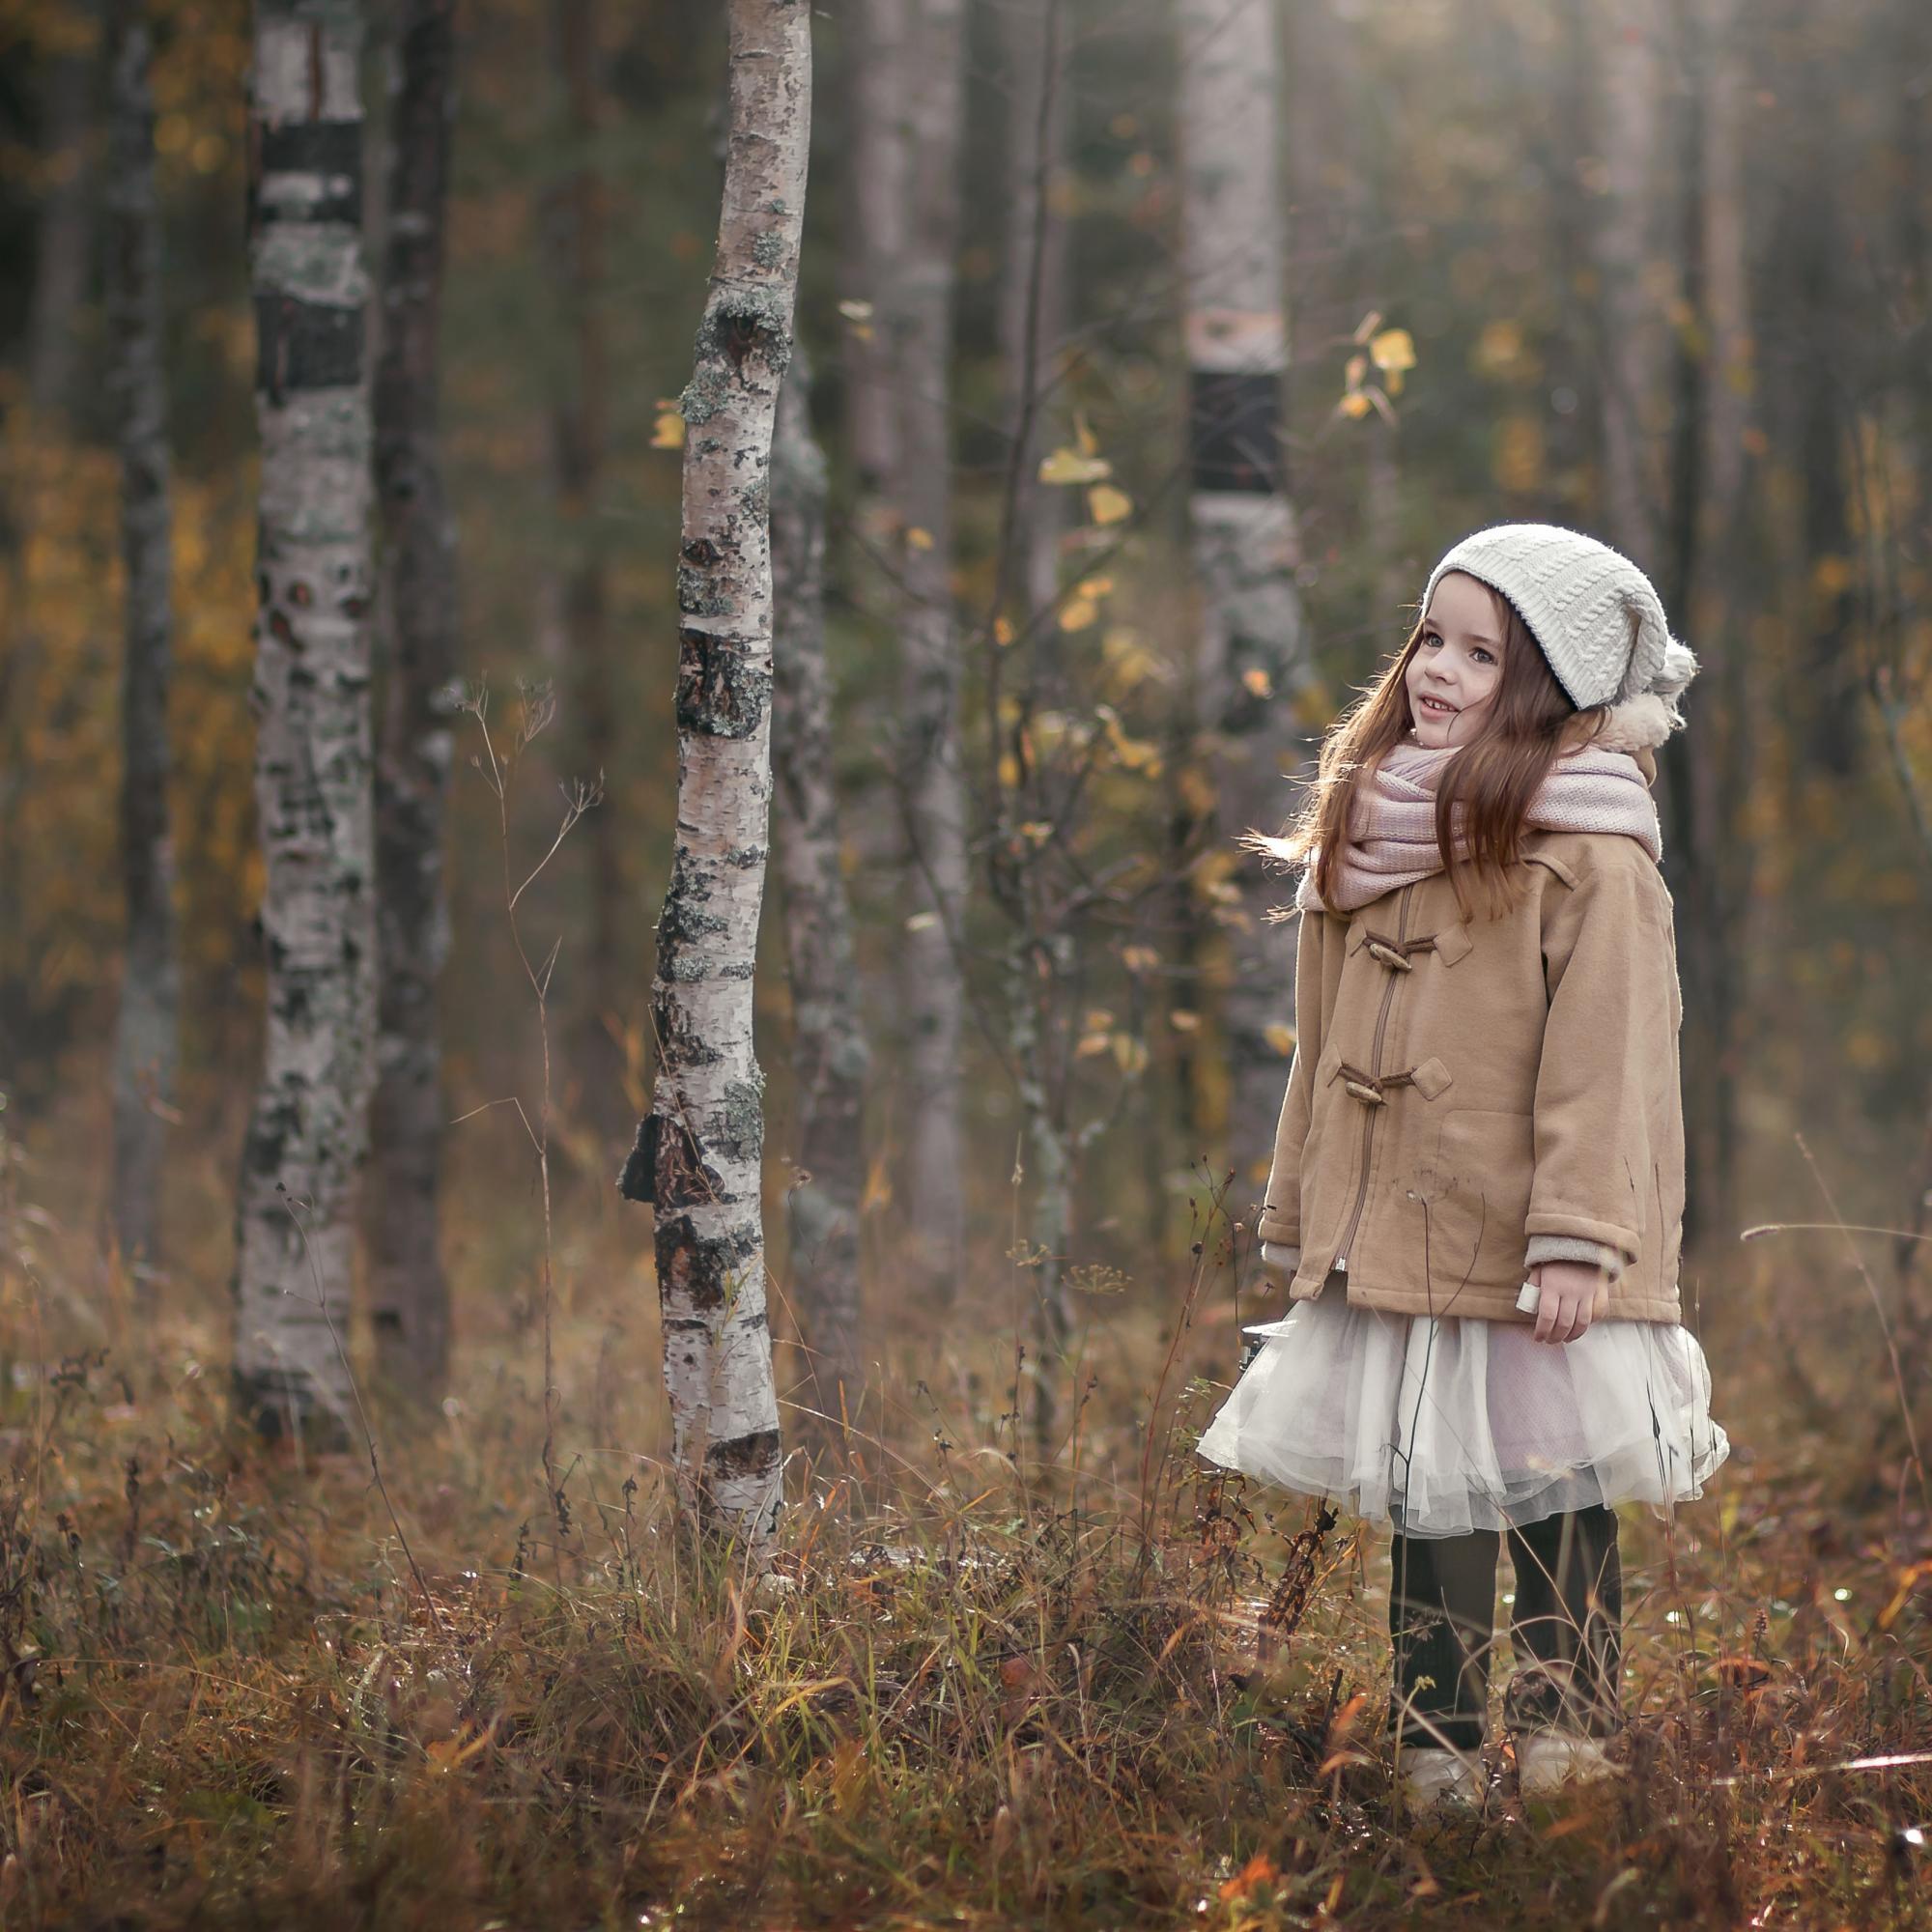 NataliNazPhoto